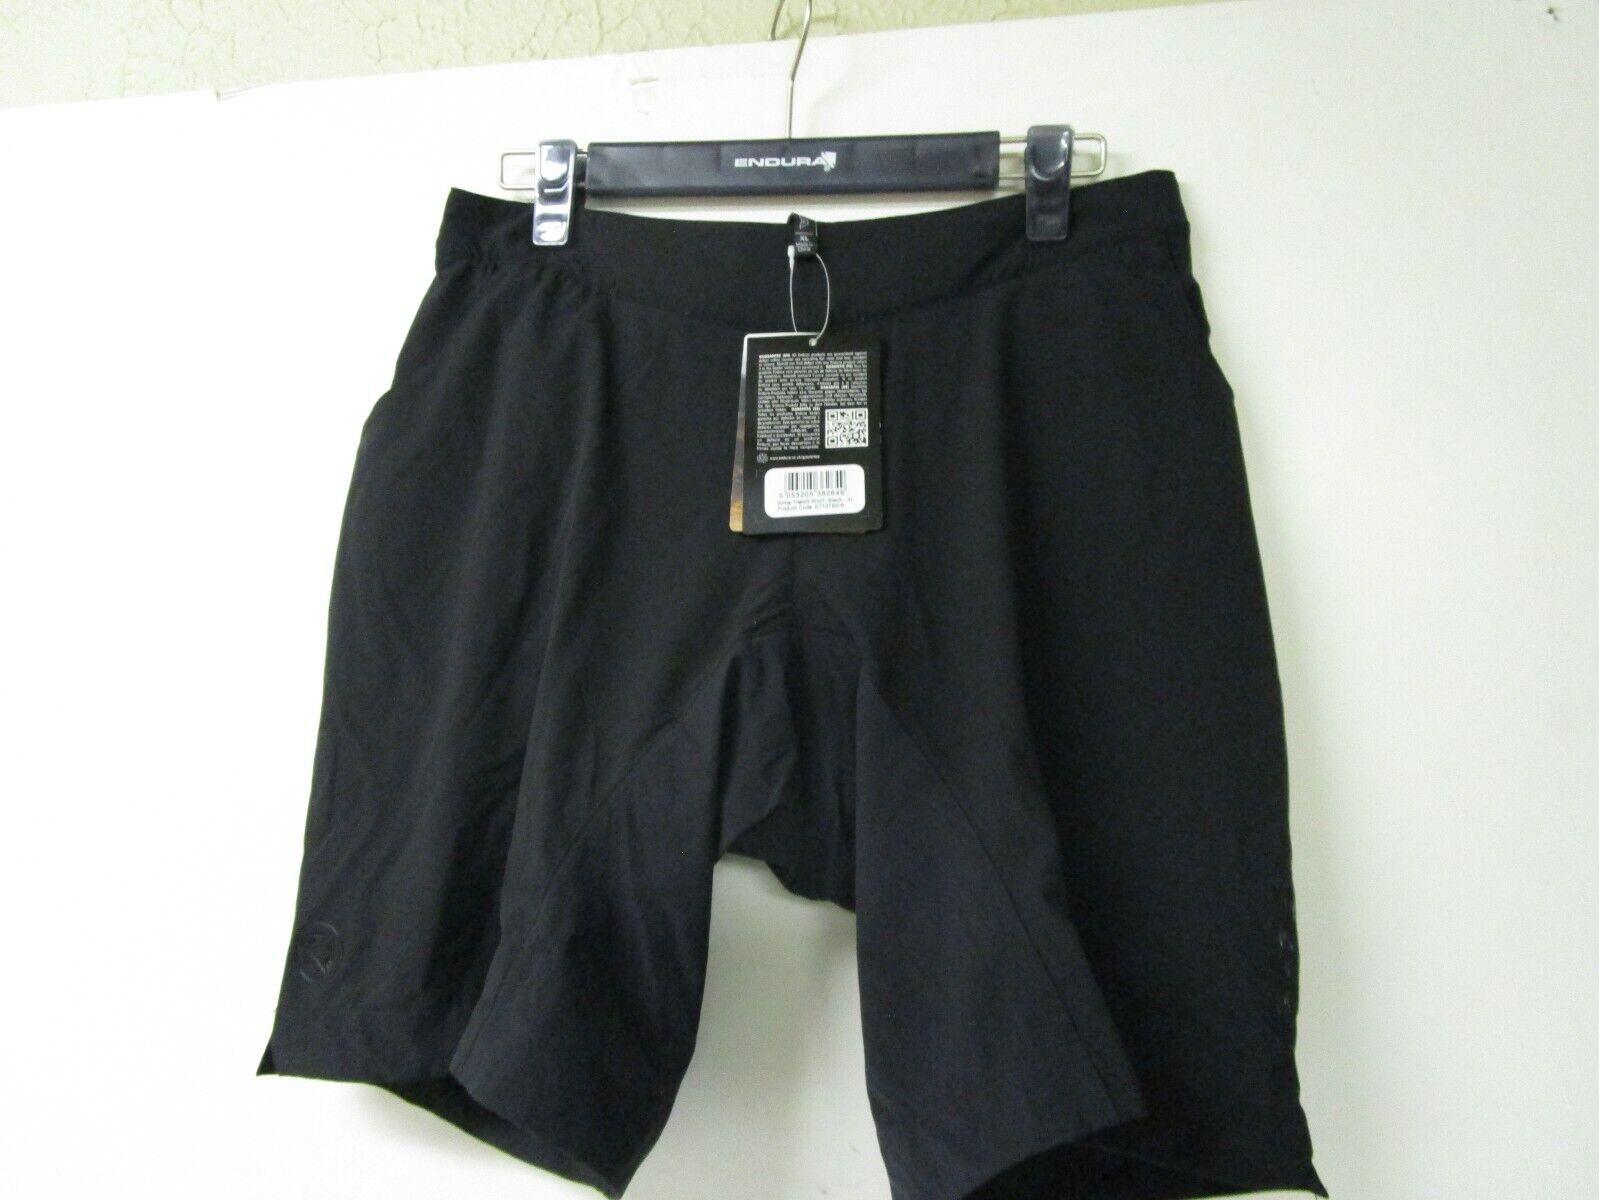 Pantalones cortos para mujer trekkit Bicicleta Ciclismo Endura Extra Grande XL Negro E7107BK 5 - Nuevo con etiquetas